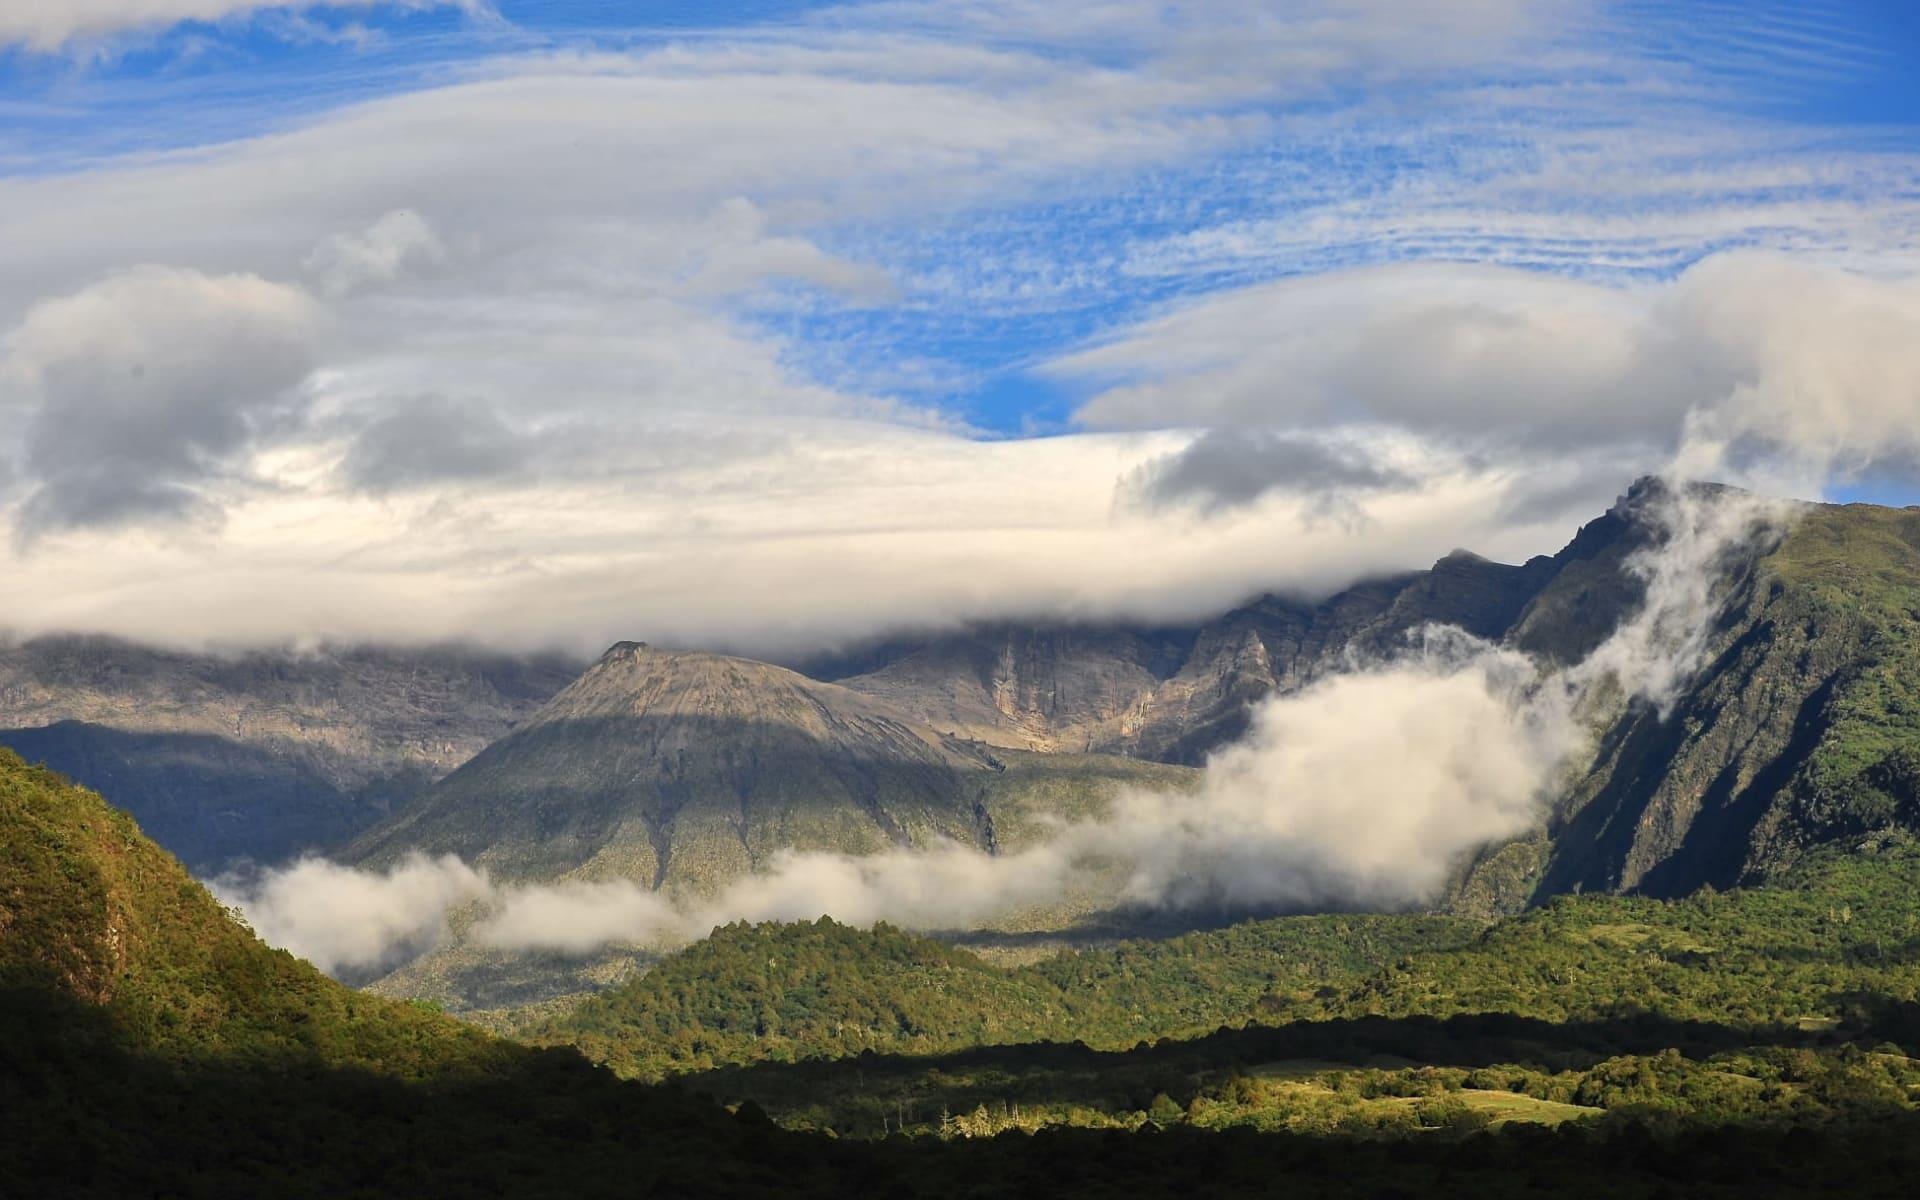 Mount Meru Besteigung ab Arusha: Mount Meru